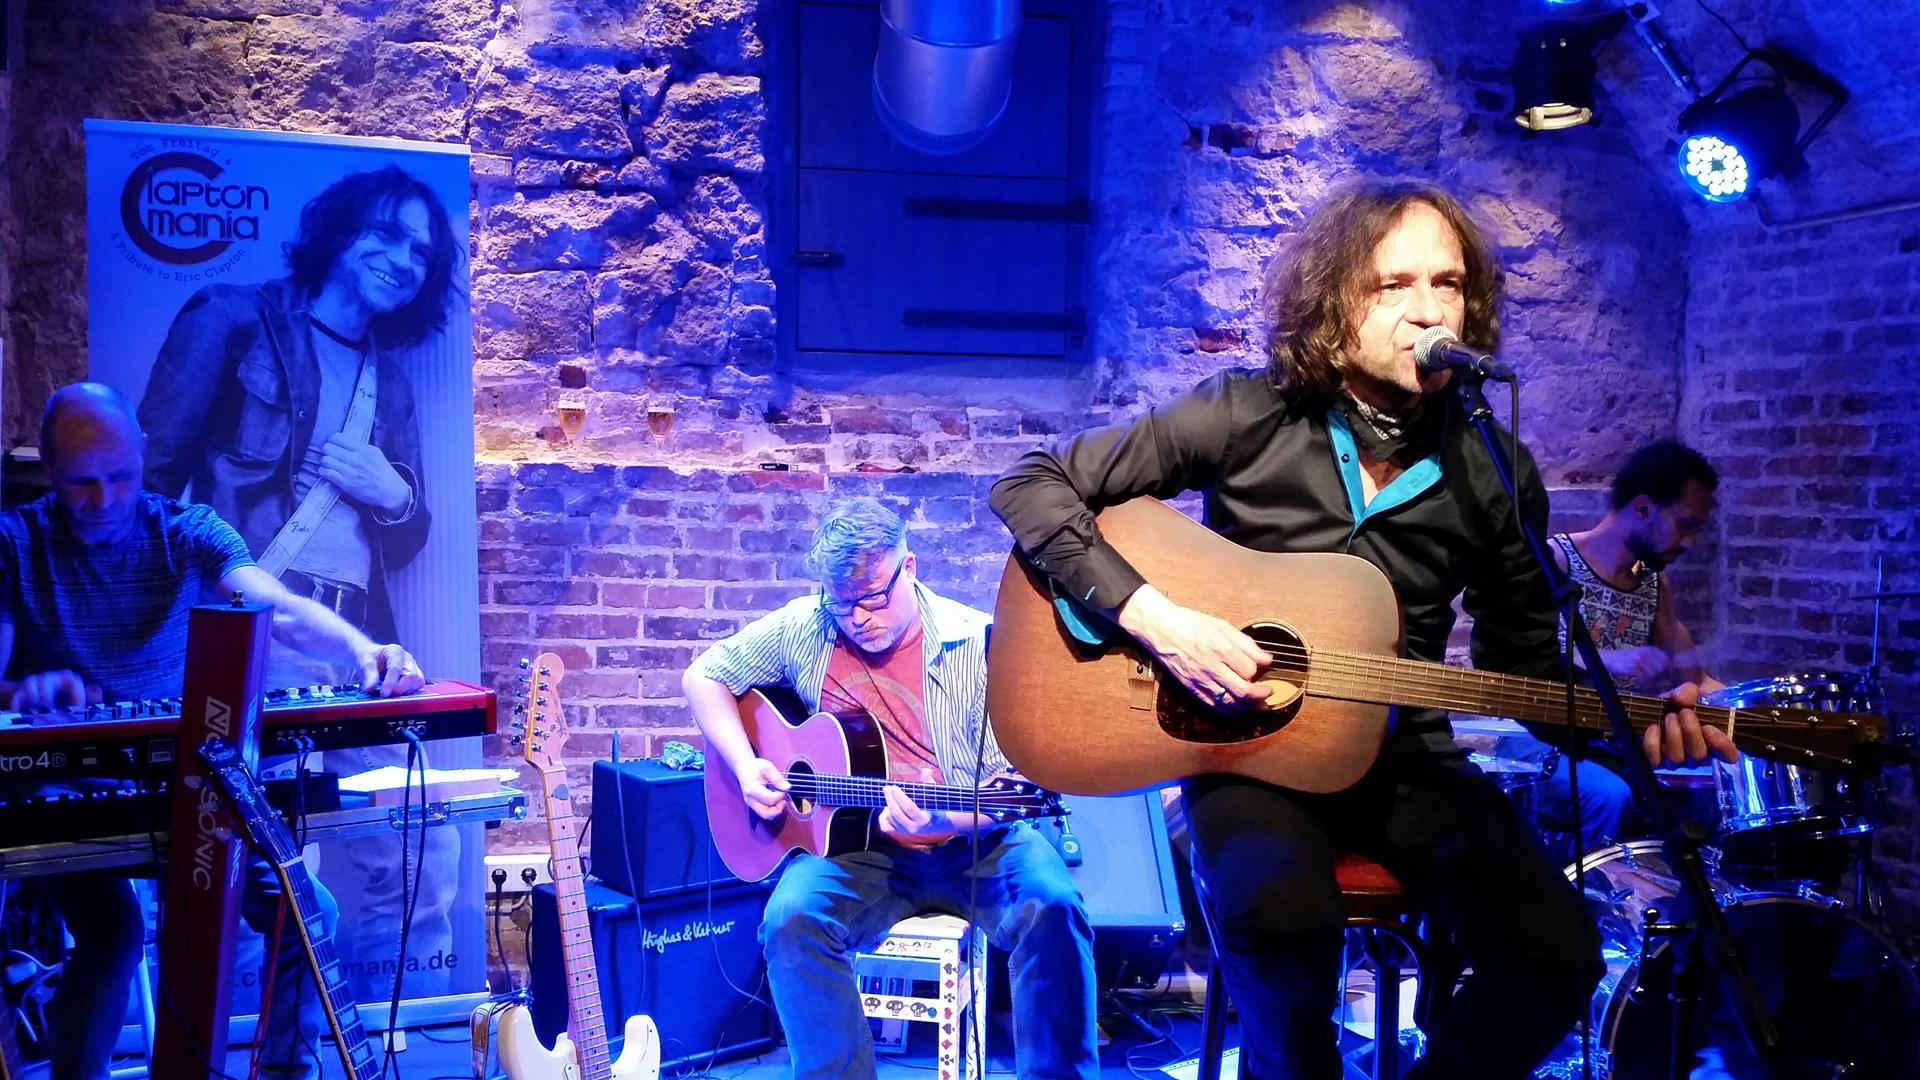 Tom Freitag & Claptonmania unplugged